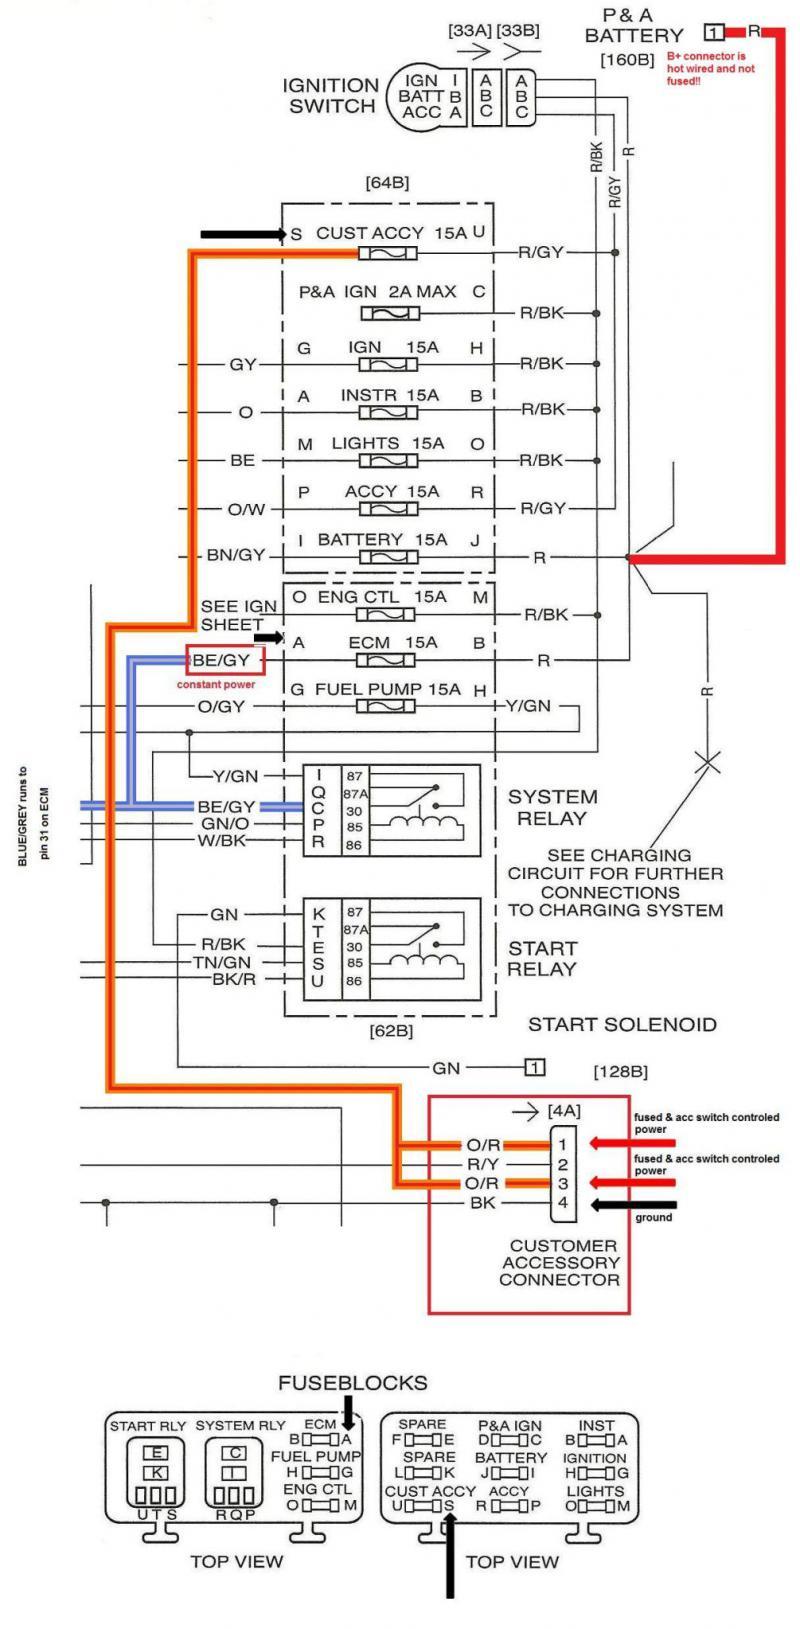 headlight wiring diagram 2016 street glide vg 2979  harley davidson dyna super glide wiring diagram download  harley davidson dyna super glide wiring